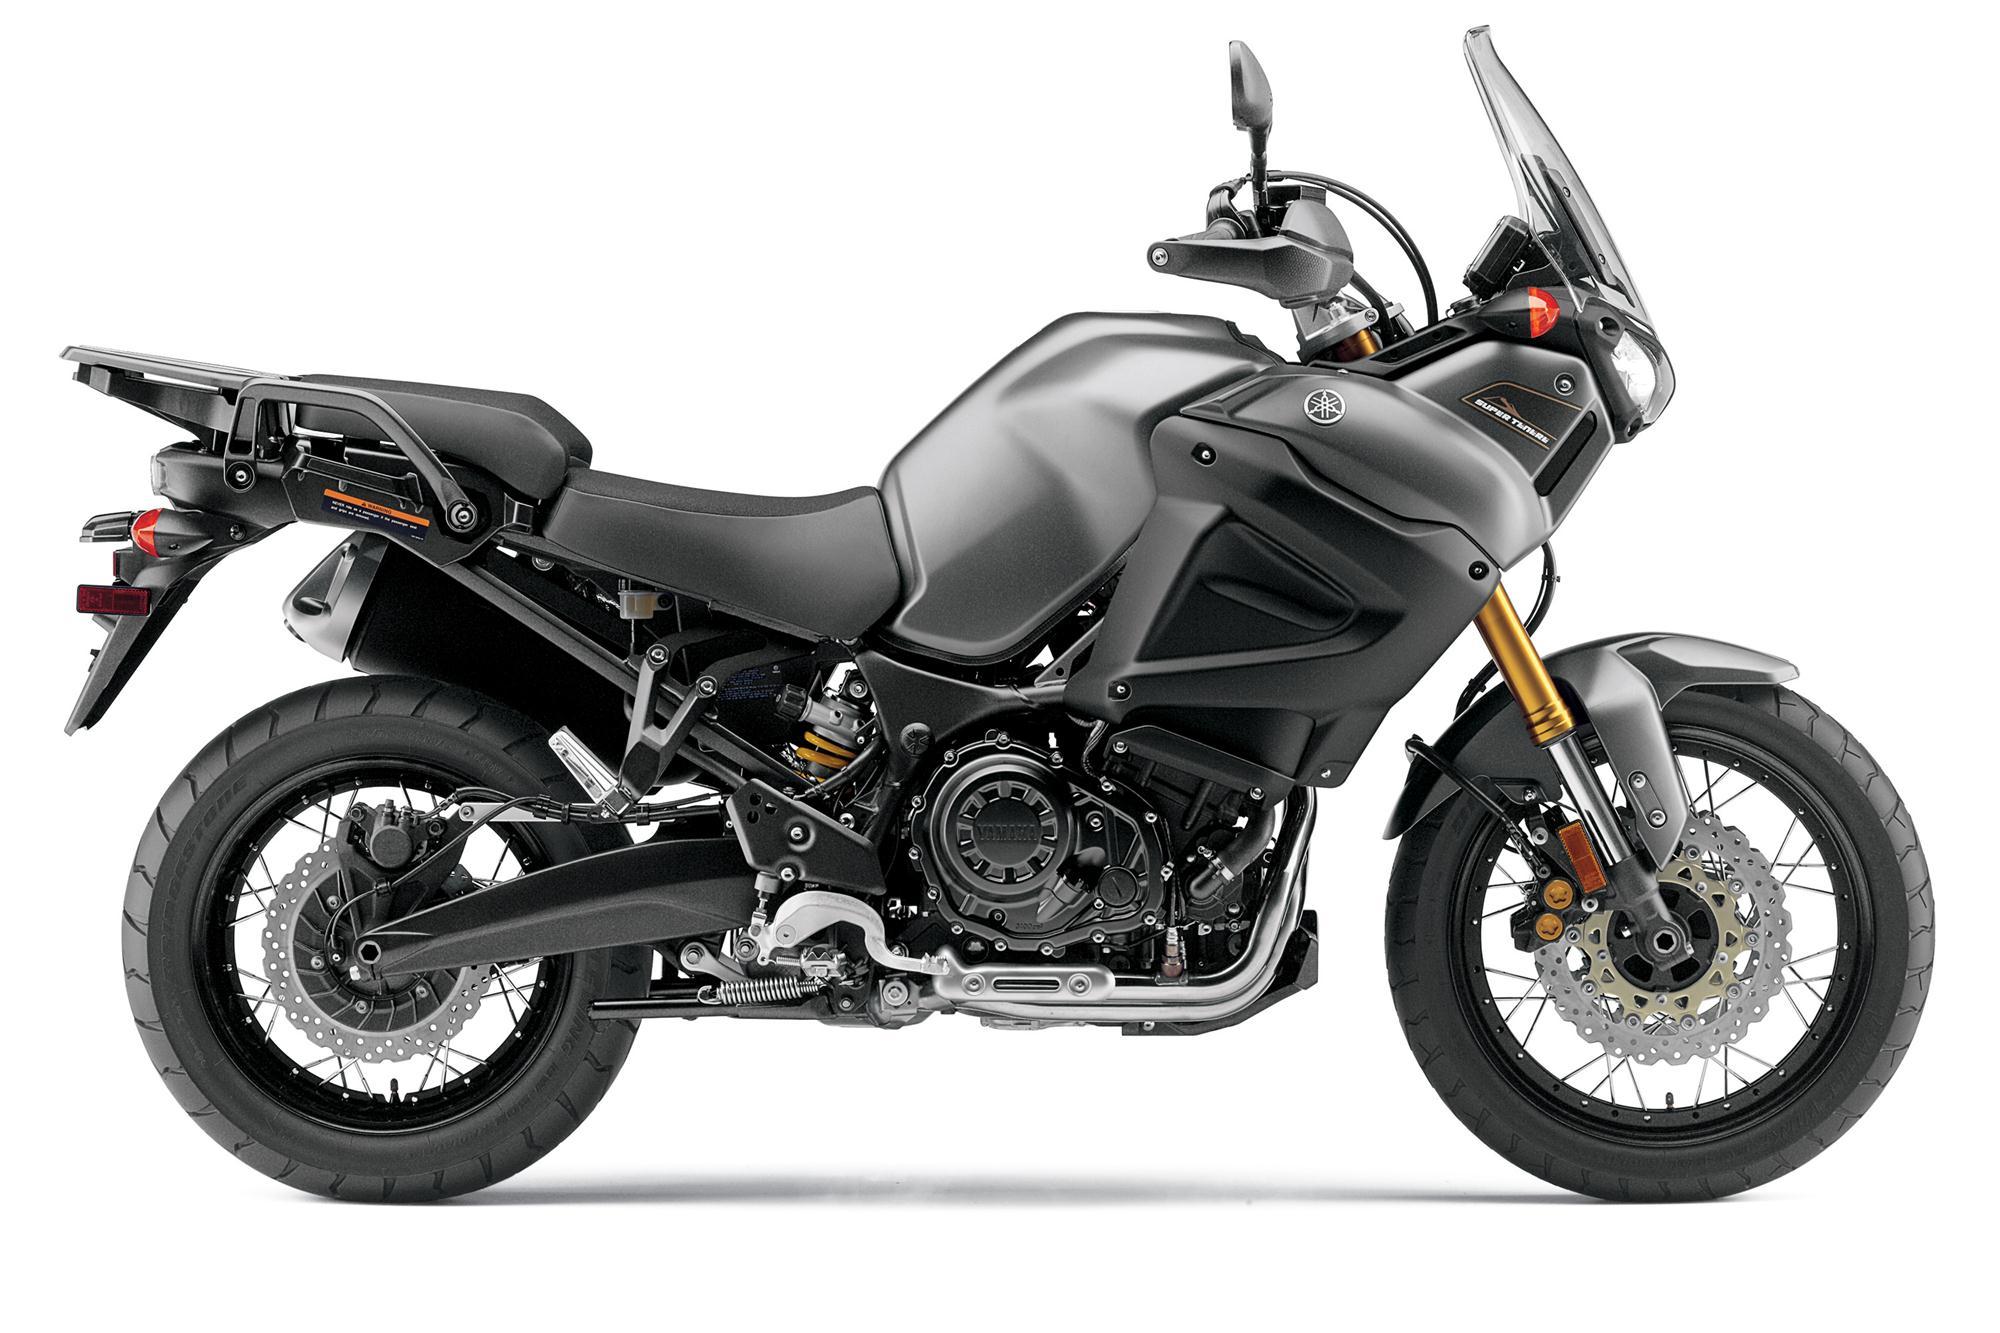 The full story: 2010 Yamaha Super Tenere 1200 - New Atlas